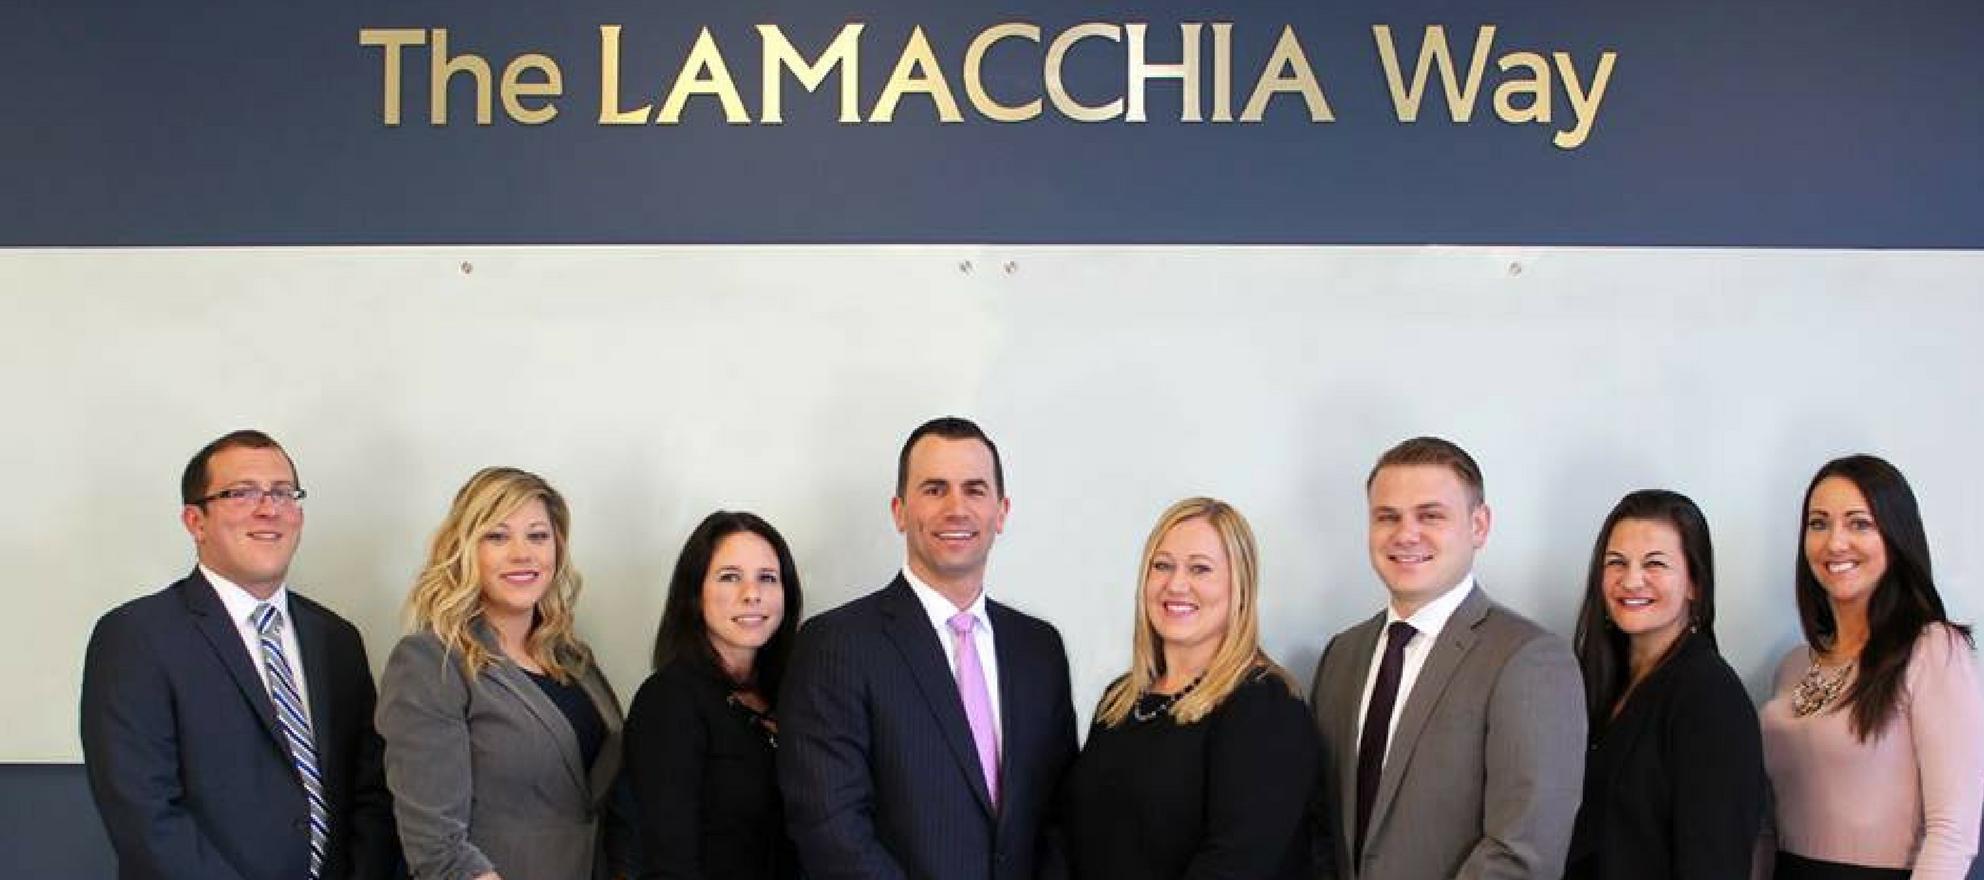 Lamacchia Realty training